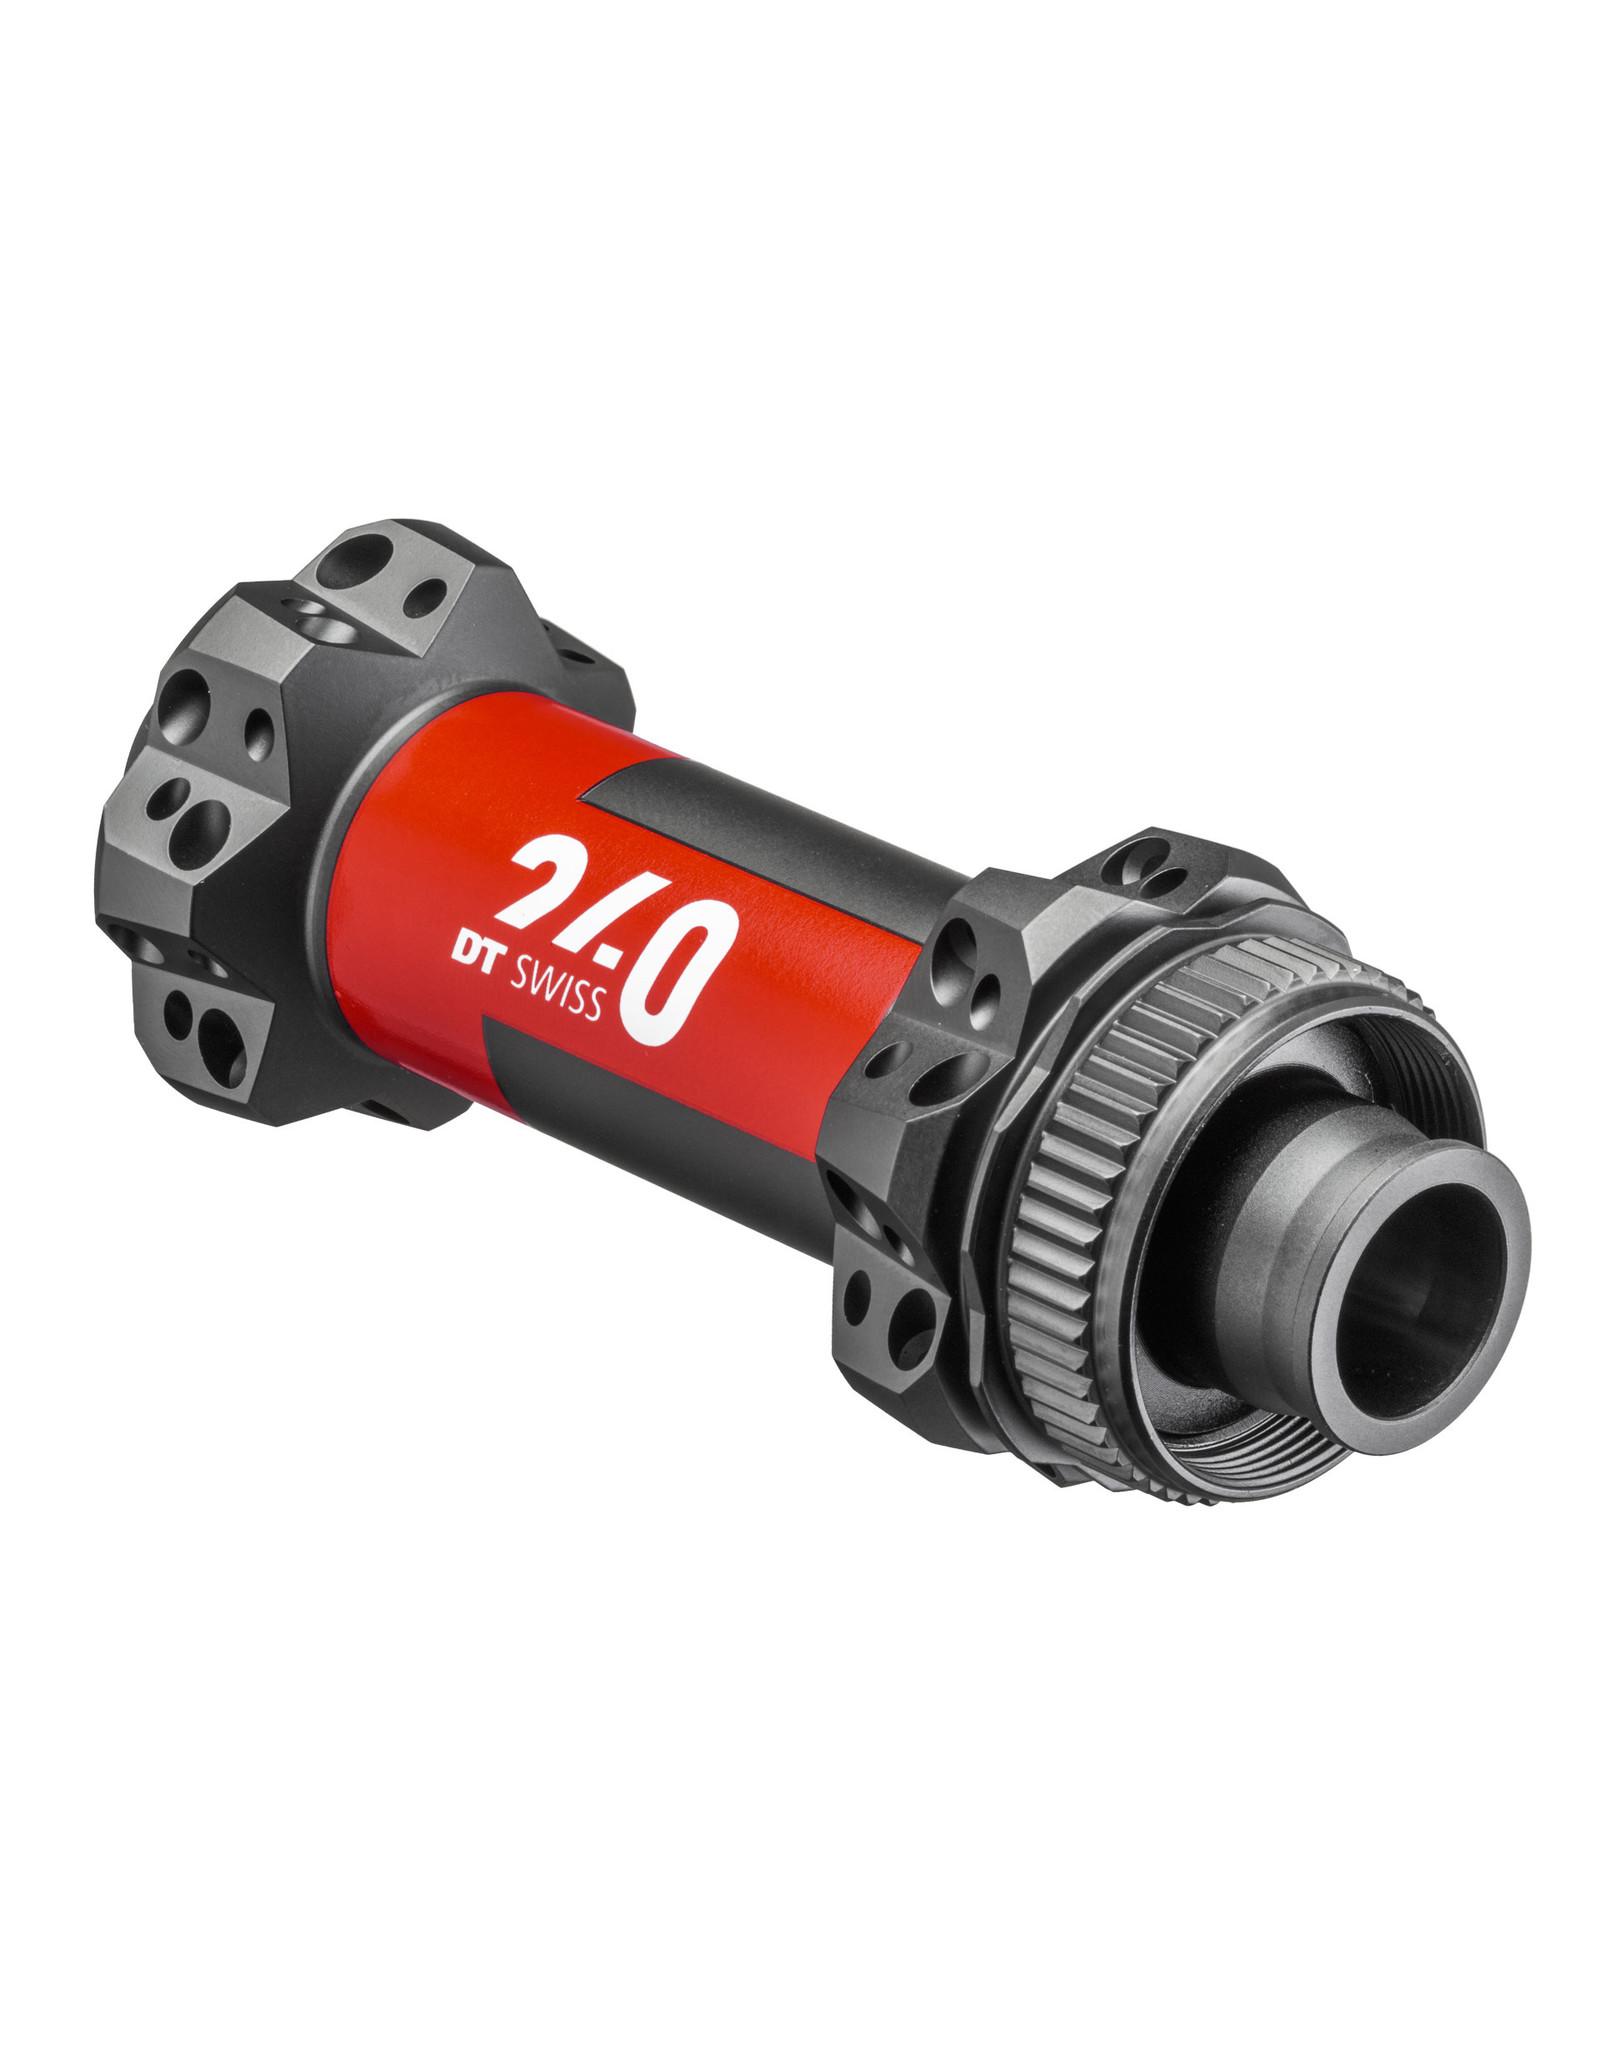 DT Swiss DT Swiss 240 EXP Boost Straight-Pull Centerlock Front Hub 28h